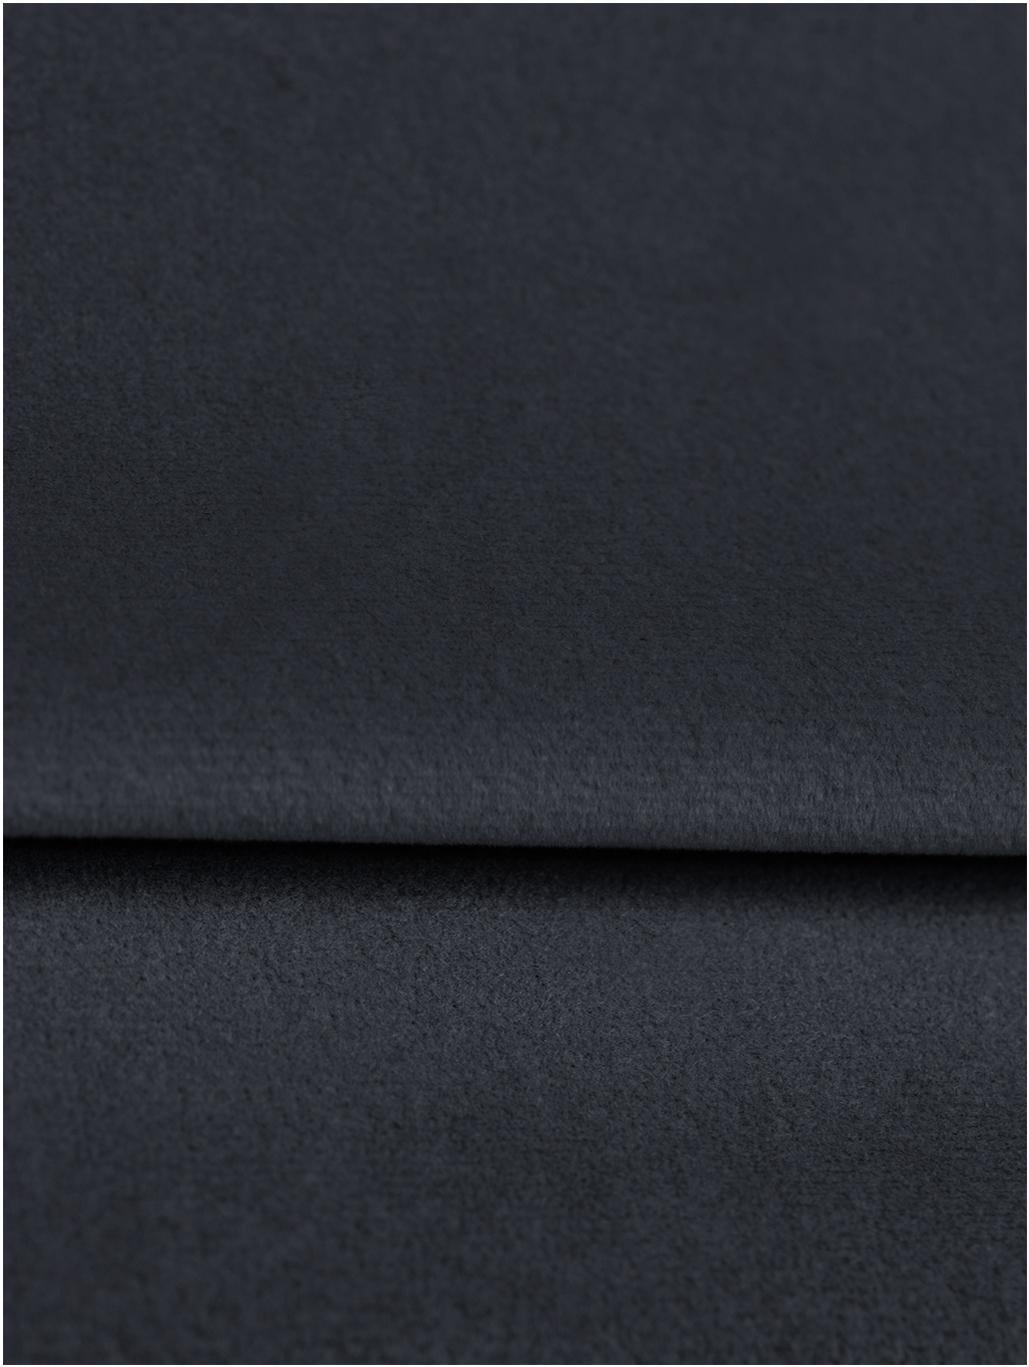 Samt-Schlafsofa Gia (3-Sitzer), Bezug: Polyestersamt Der strapaz, Rahmen: Massives Kiefernholz, Korpus: Spanplatte, Sperrholz, Sp, Füße: Buchenholz, lackiert, Samt Blau, B 212 x T 93 cm